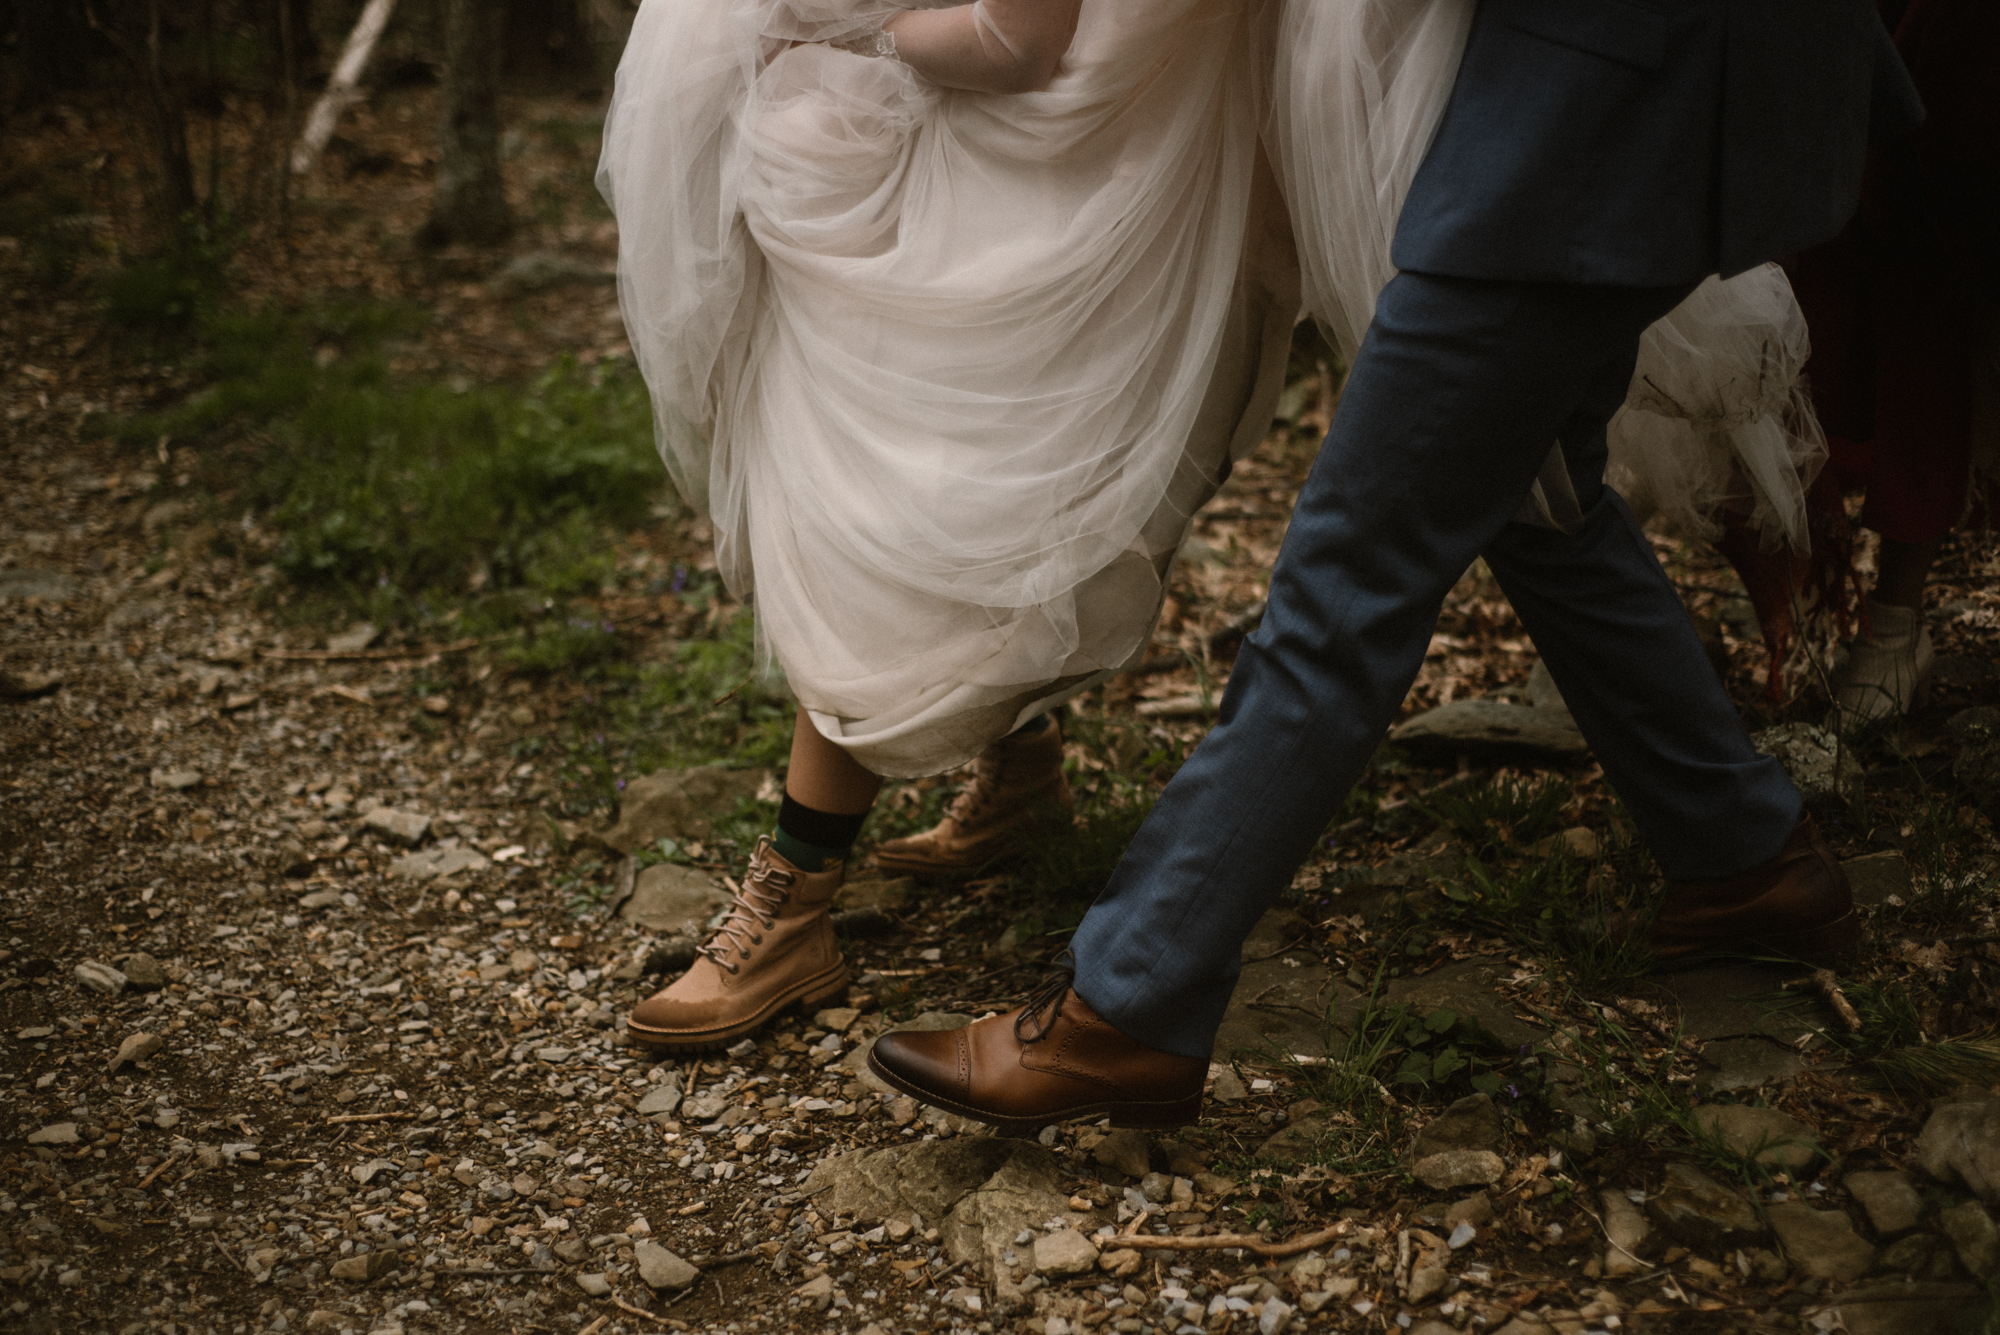 Paula and Andrew - Small Adventurous Wedding in Shenandoah National Park - Blue Ridge Mountain Wedding - White Sails Creative - Mountain Elopement_46.jpg